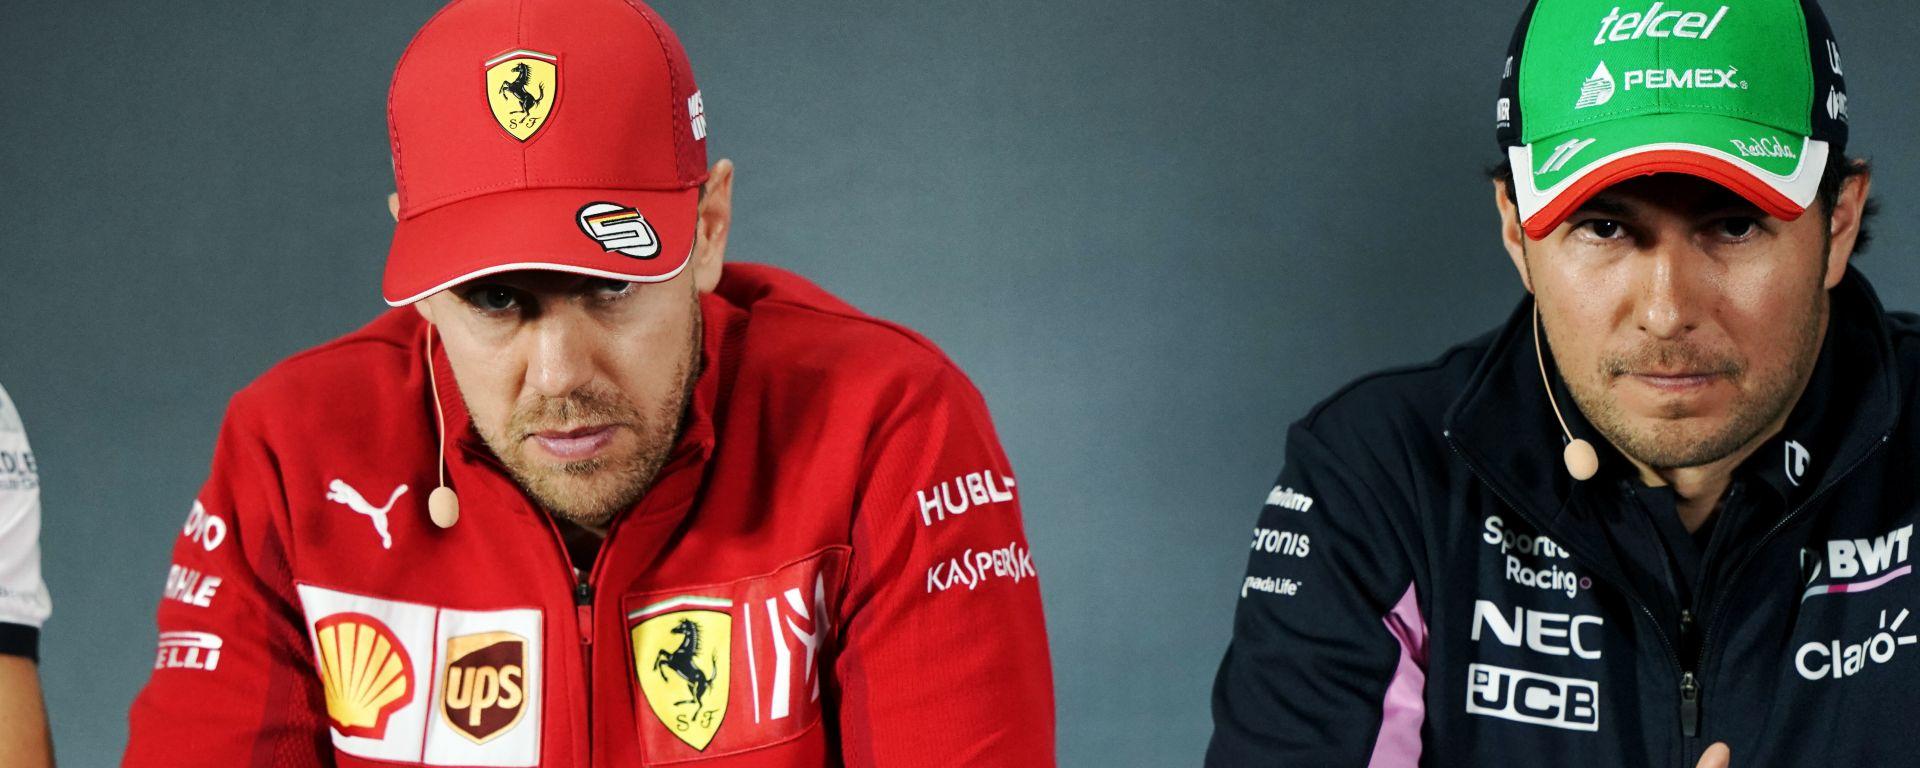 F1, GP Messico 2019: Sebastian Vettel (Ferrari) e Sergio Perez (Racing Point)